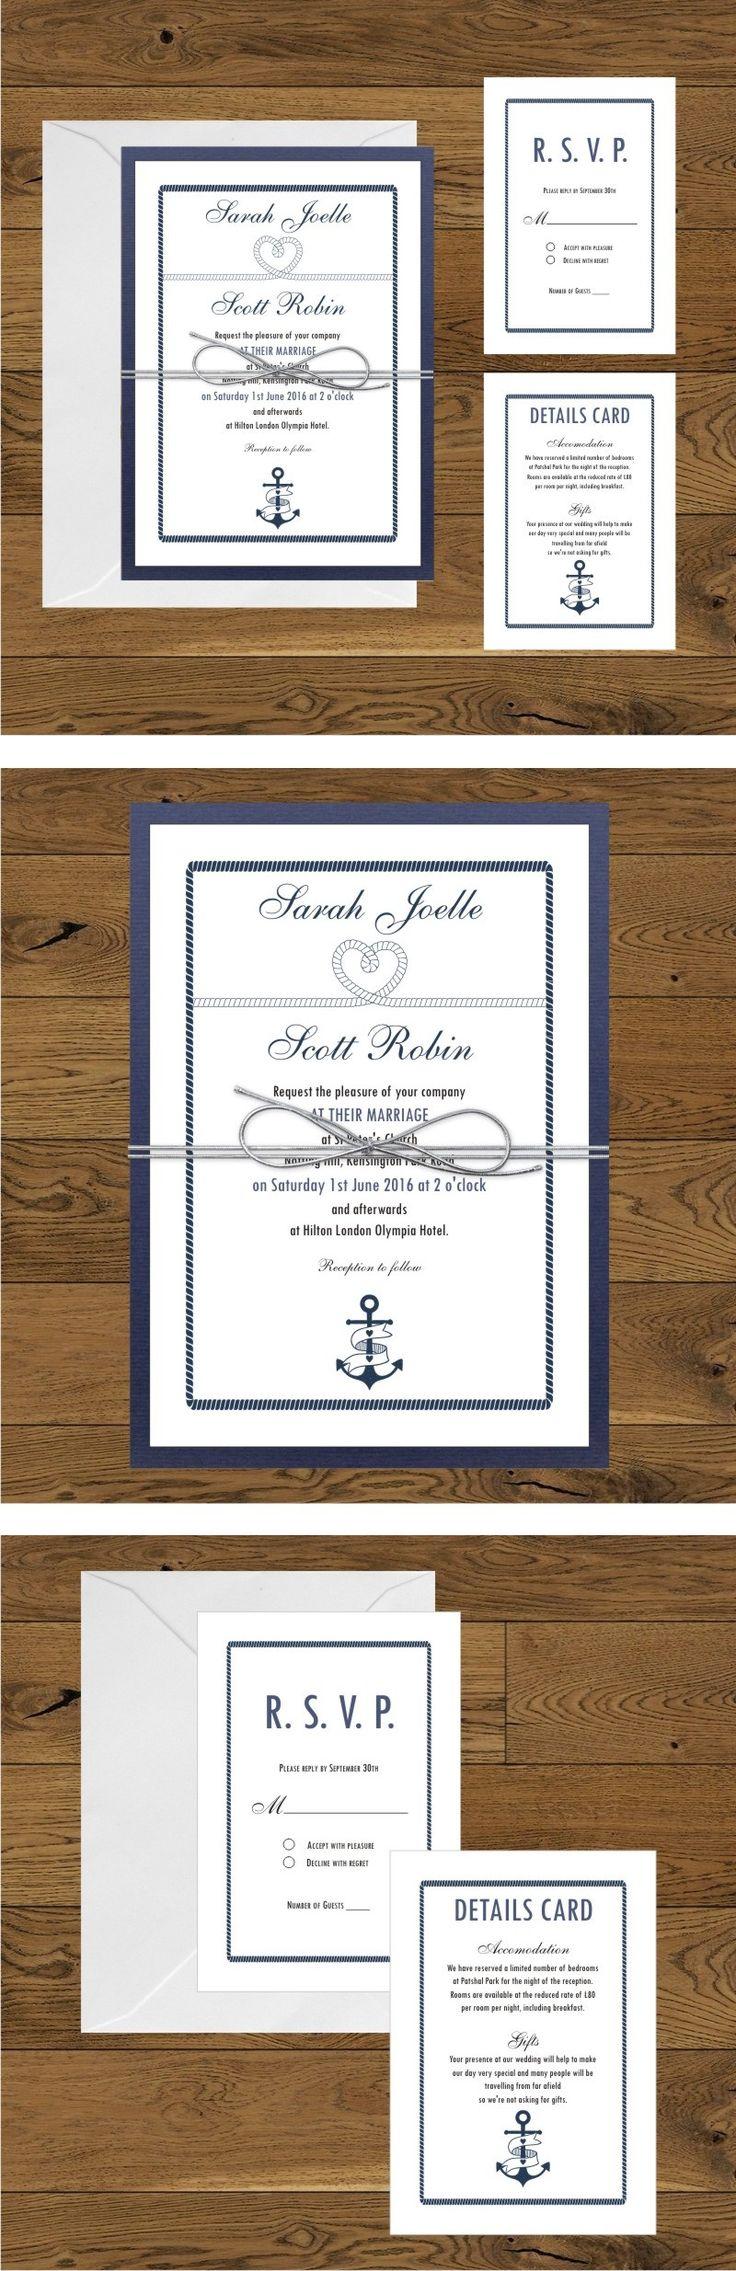 Nautical wedding invitations - navy blue and white